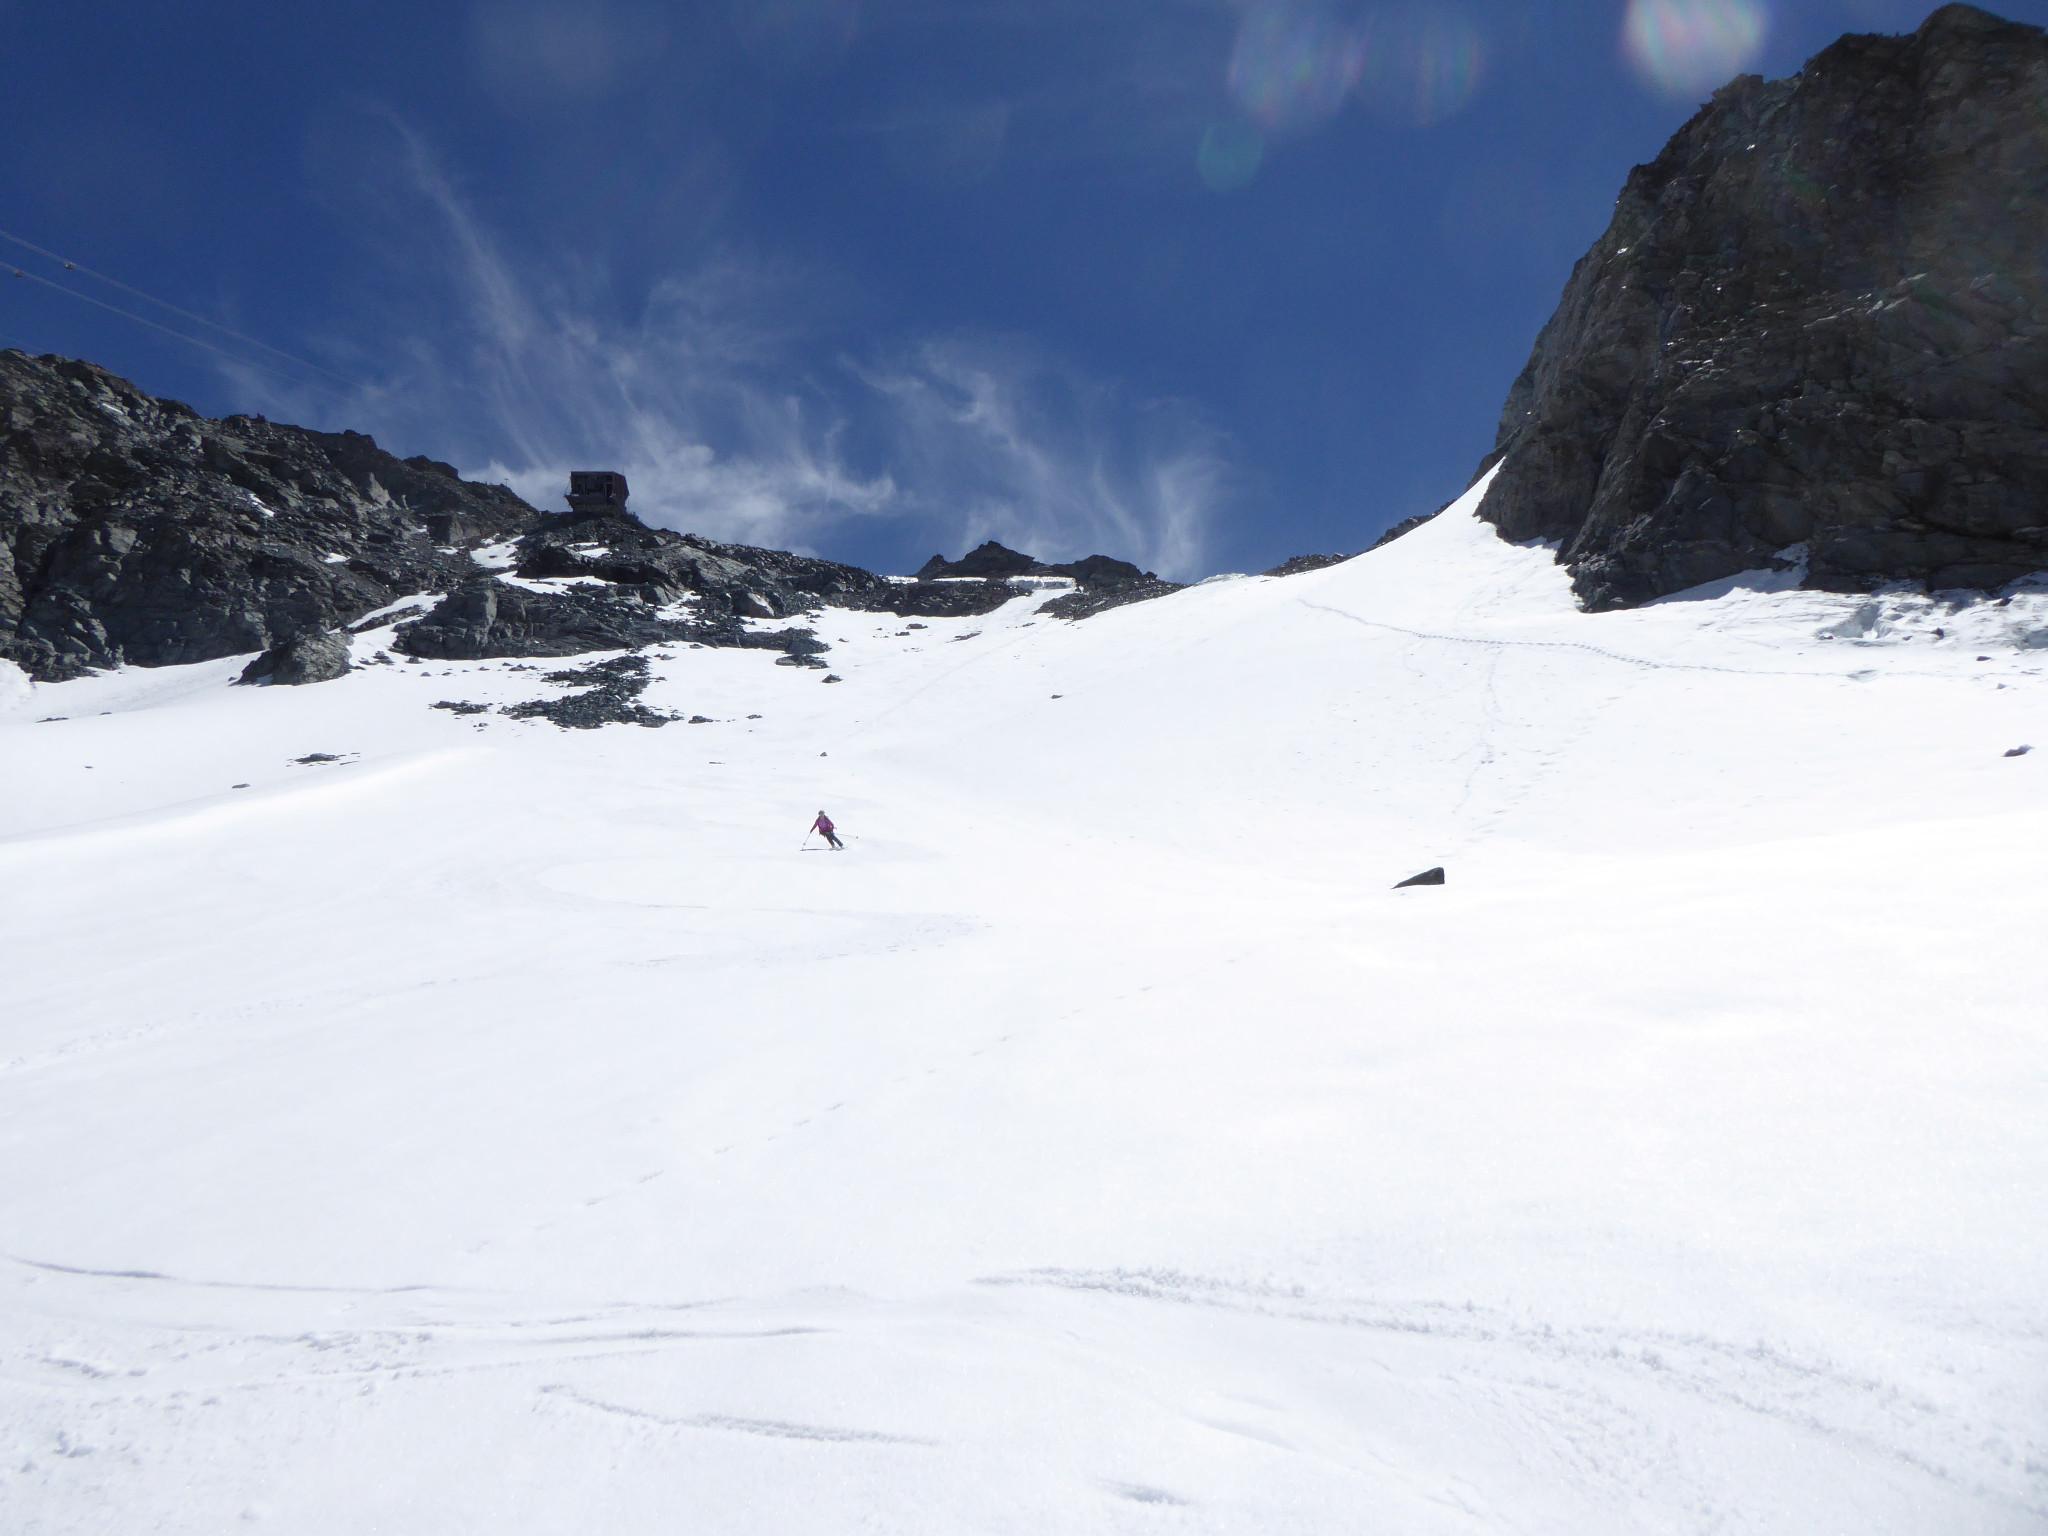 Mont Fort : Versant WNW, voie normale, piste de ski... - Camptocamp.org